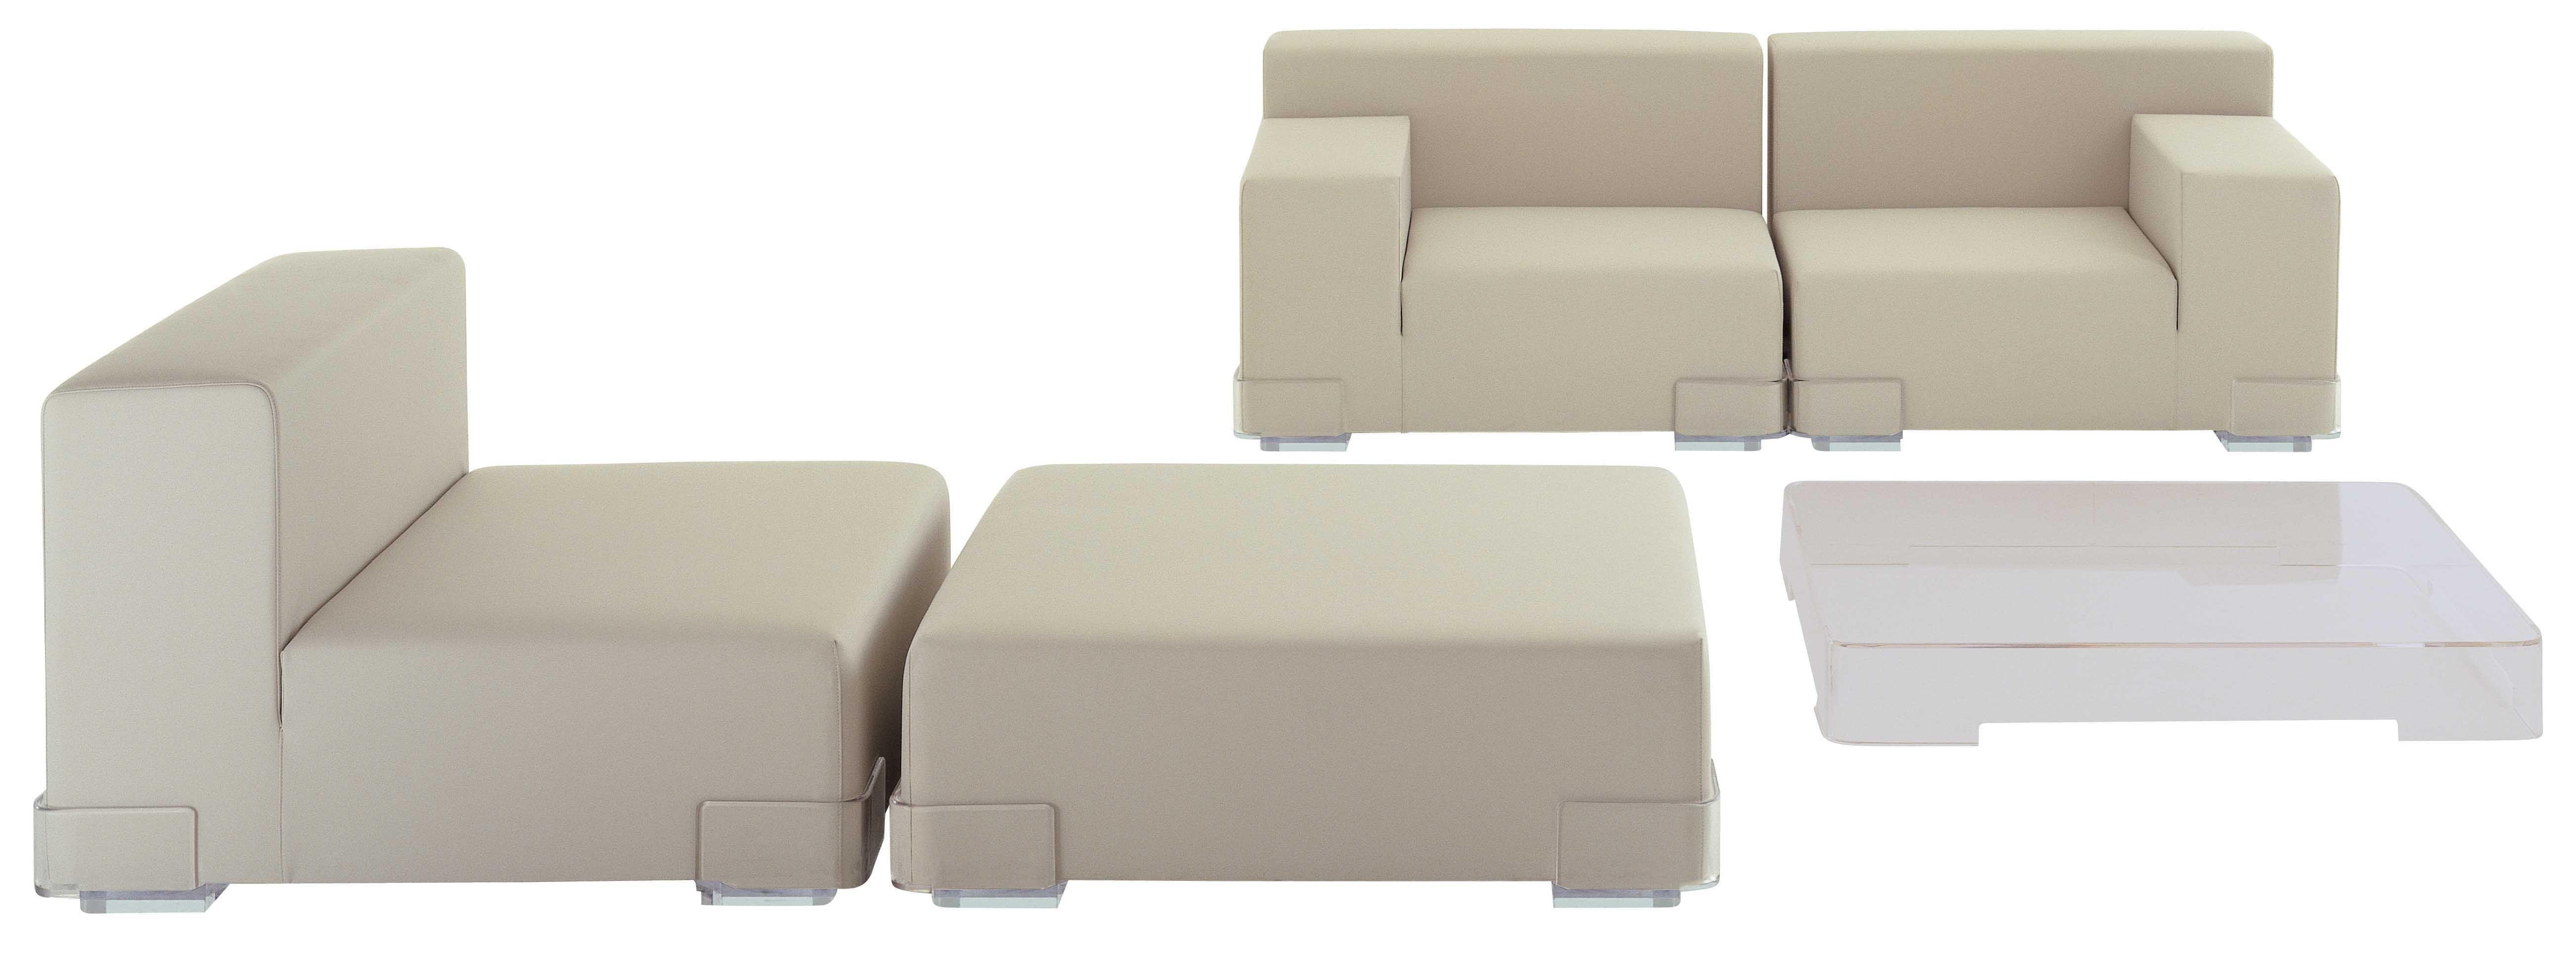 Plastics ohne armlehne kartell sofa modulierbar Sofa ohne armlehne